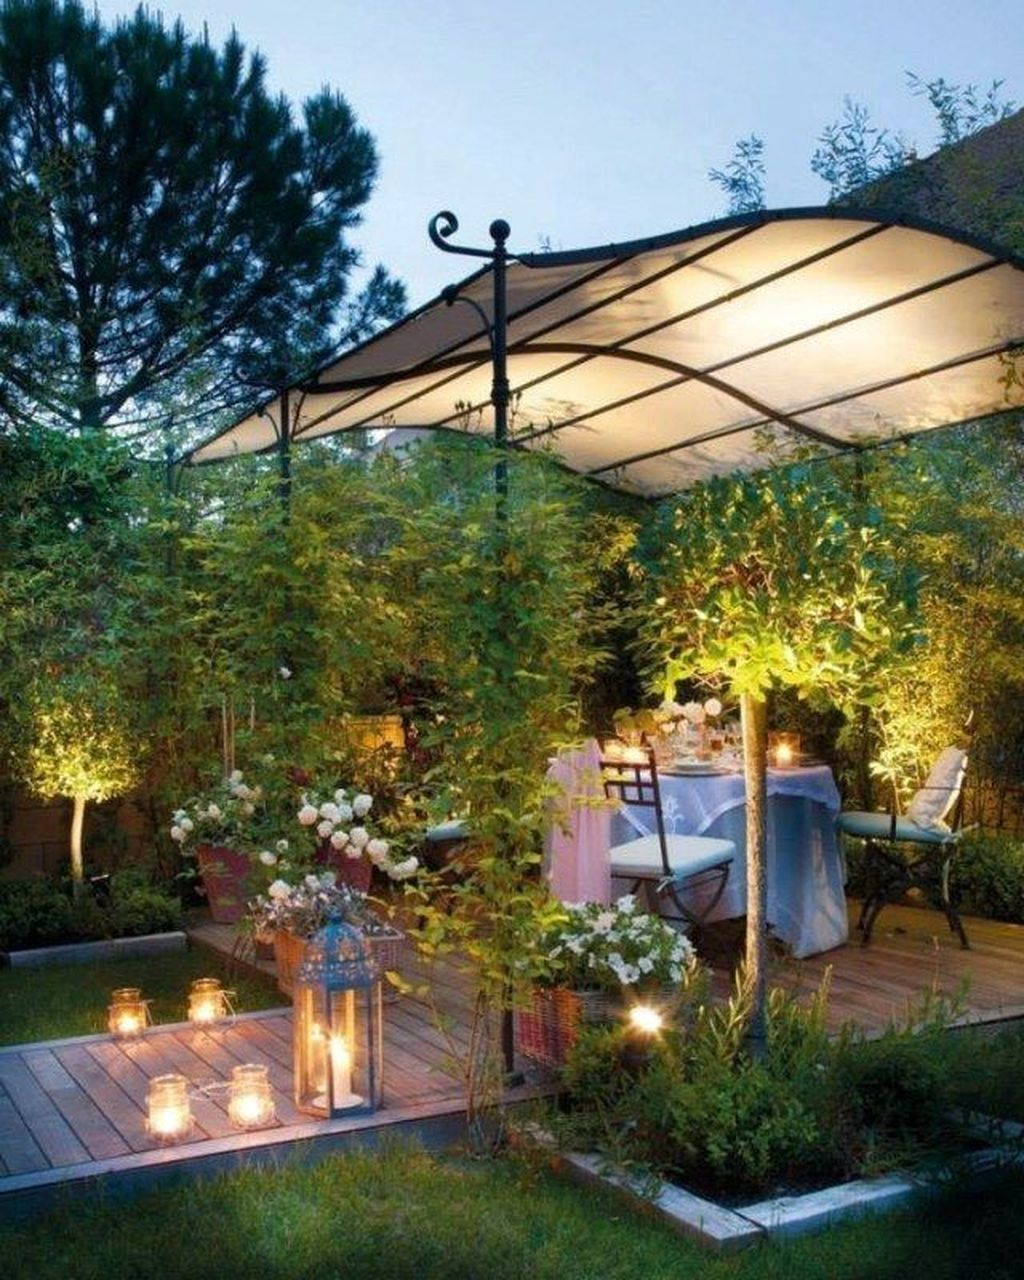 The Best Romantic Backyard Decorating Ideas 11